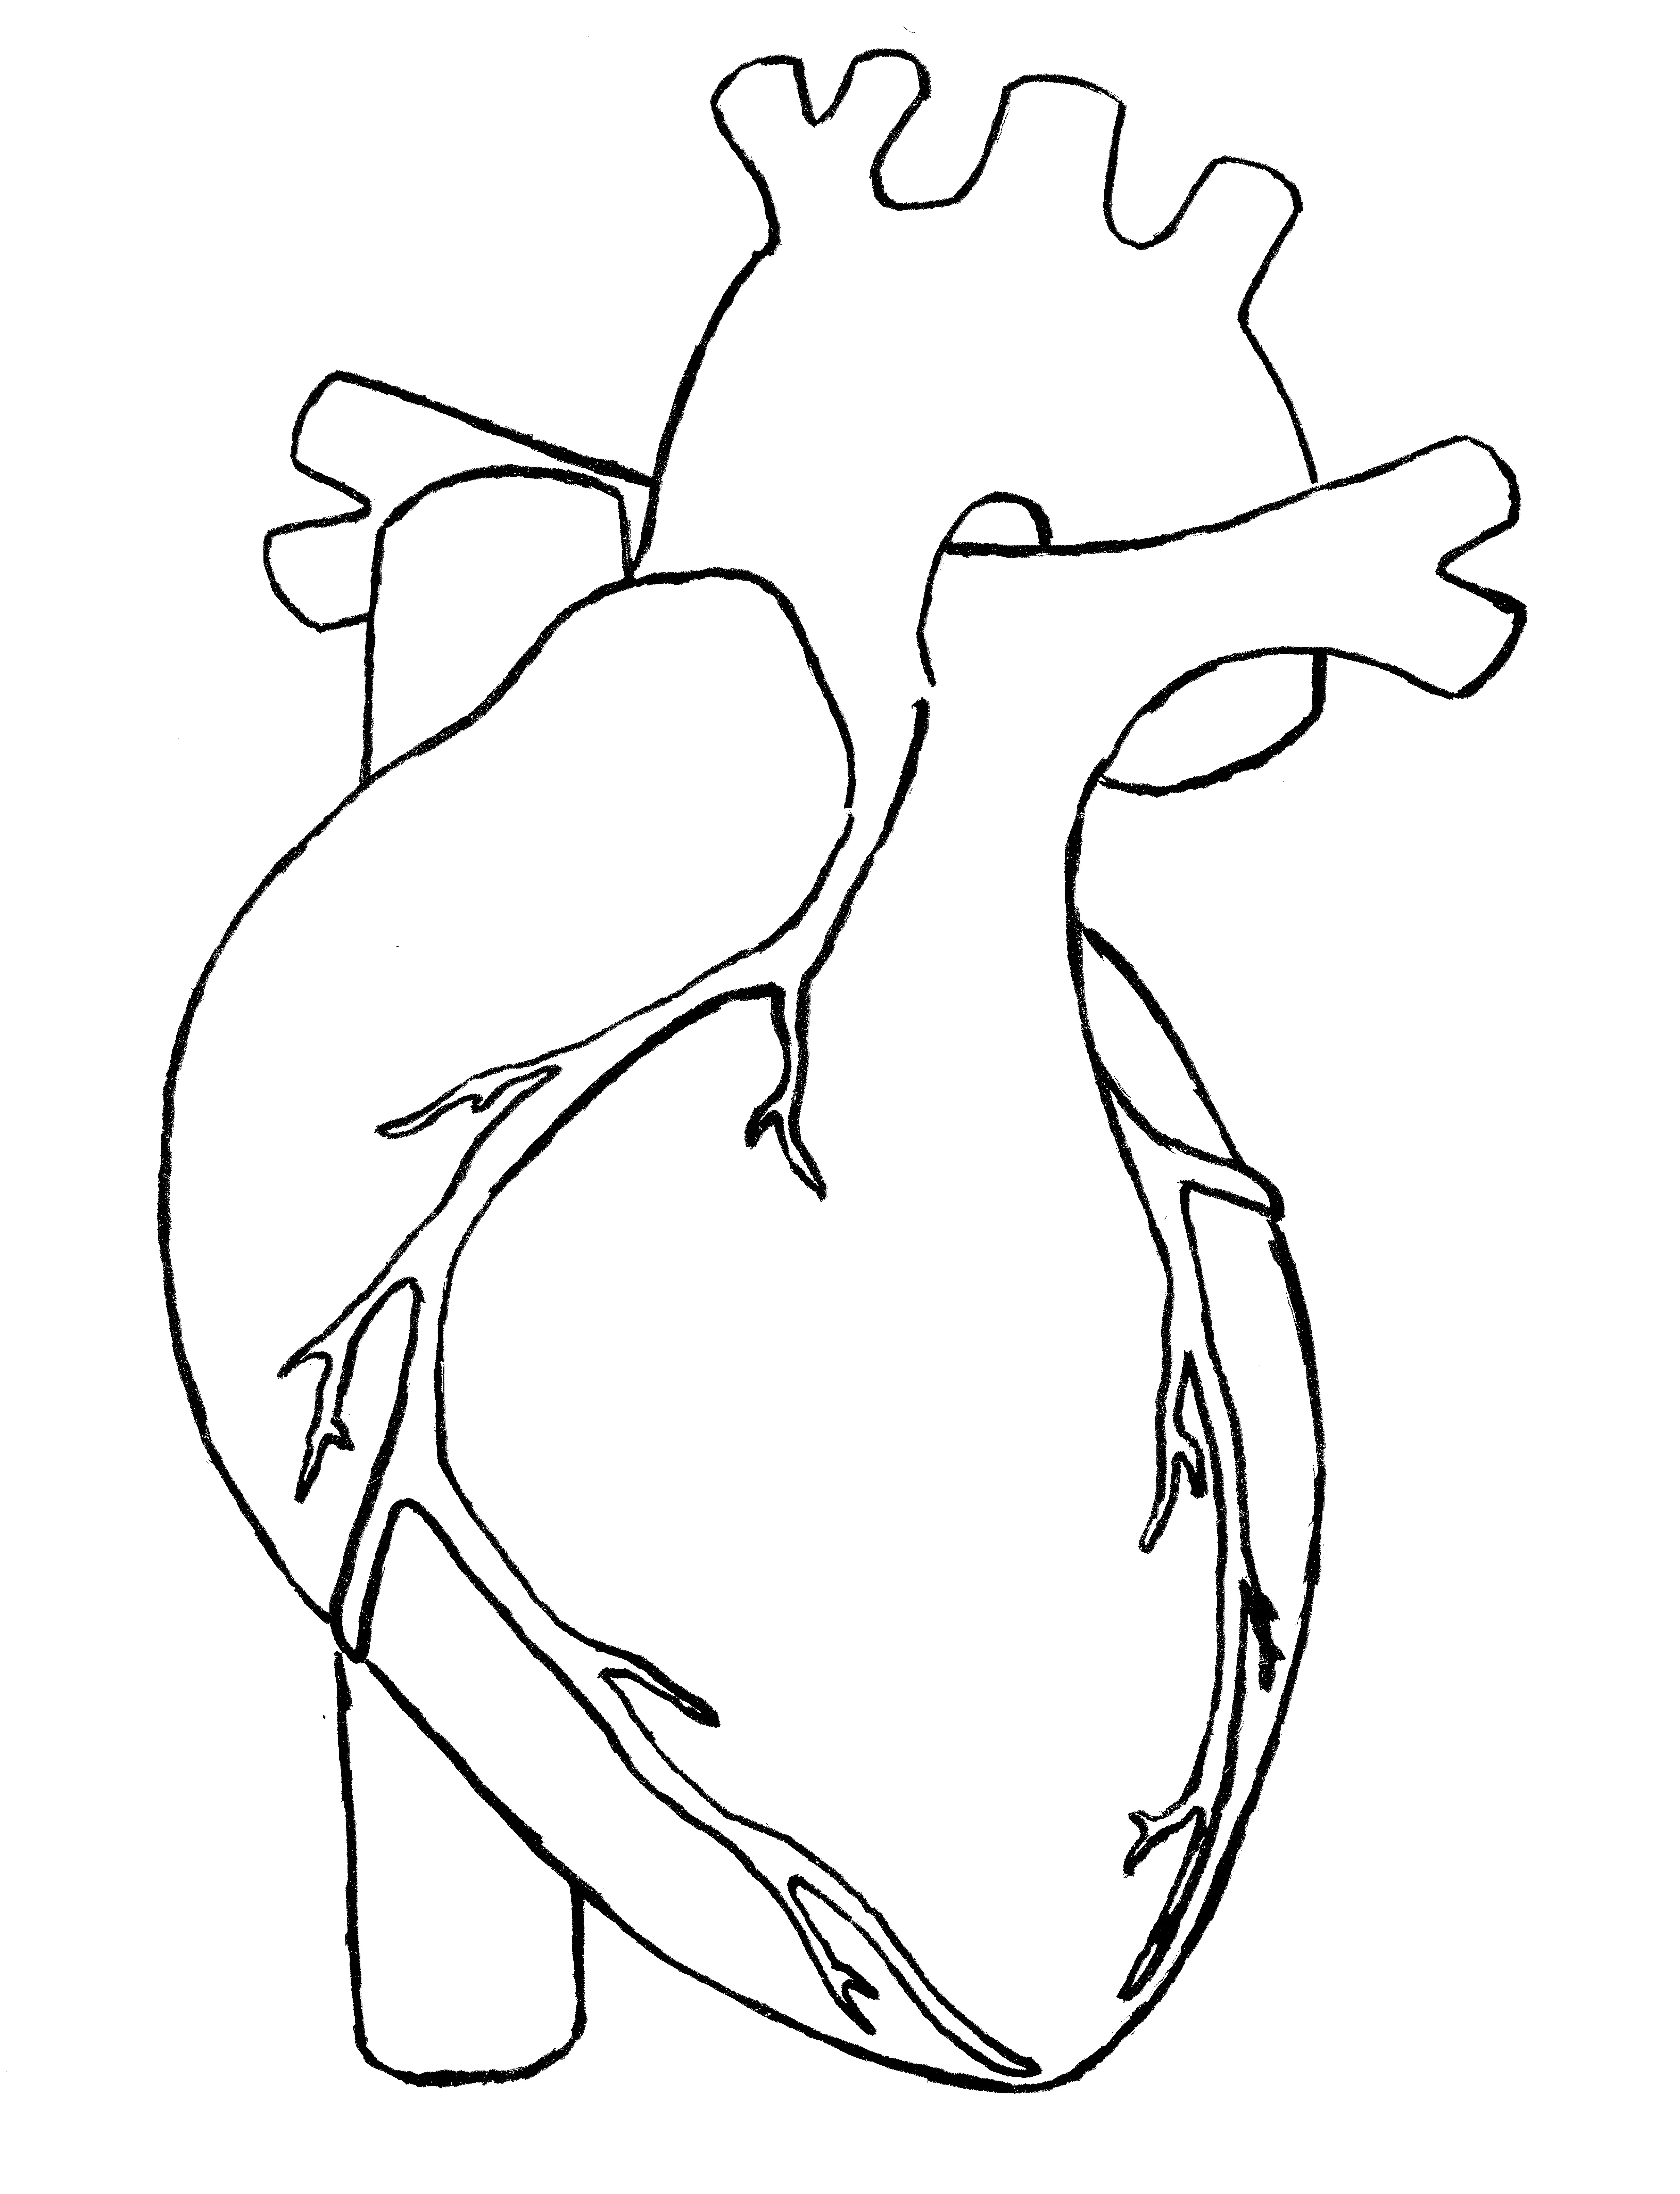 Organs clipart actual heart Human of Anatomy Human Free